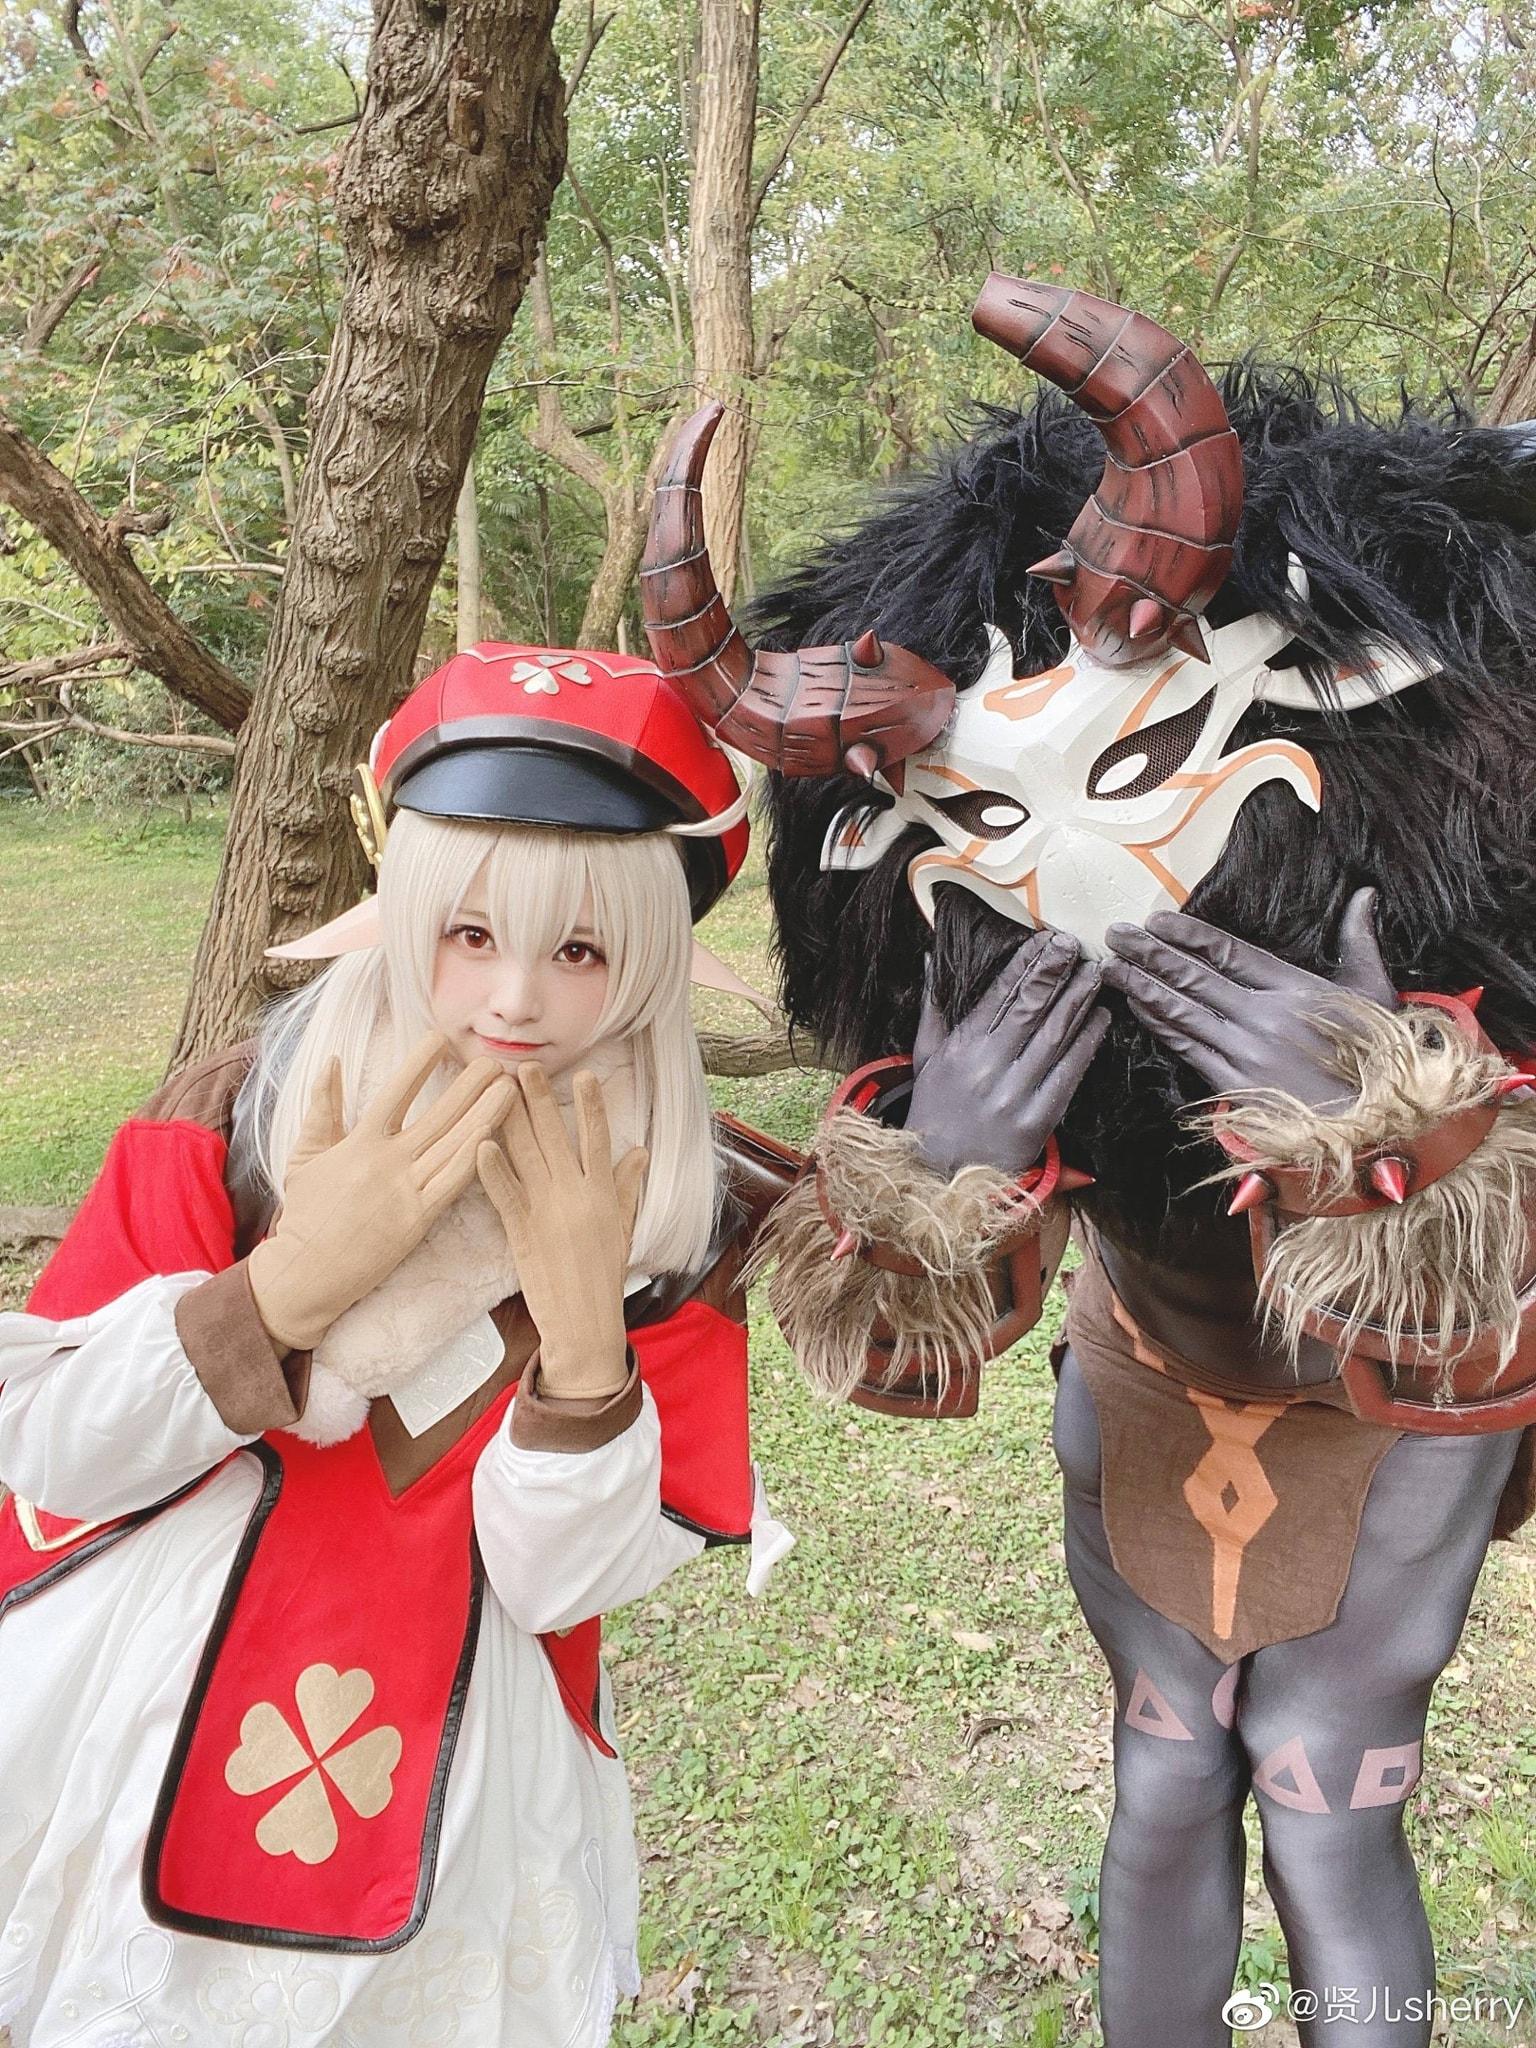 Genshin Impach 1122020 2